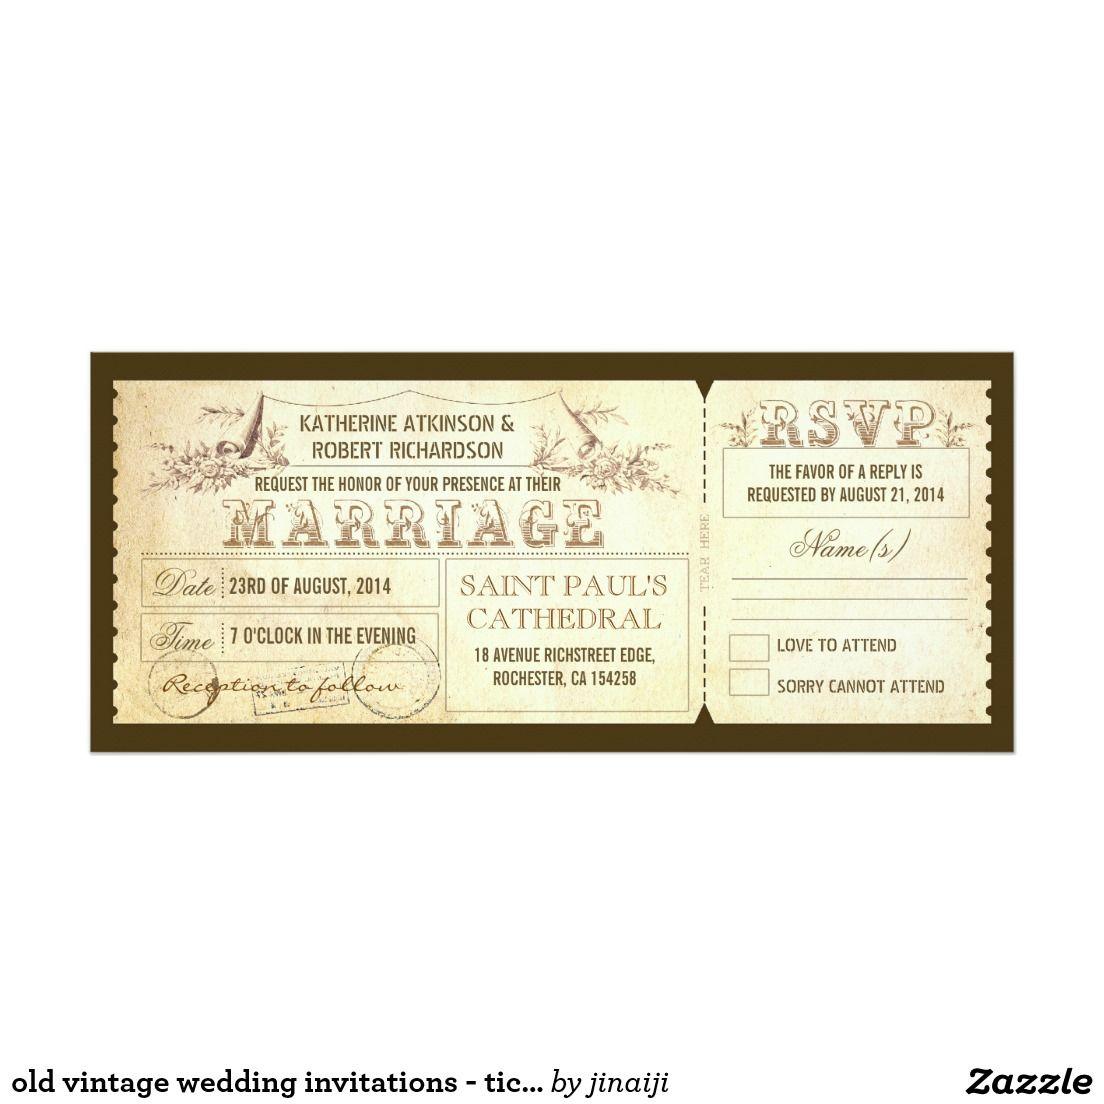 old vintage wedding invitations - tickets & RSVP | Vintage wedding ...